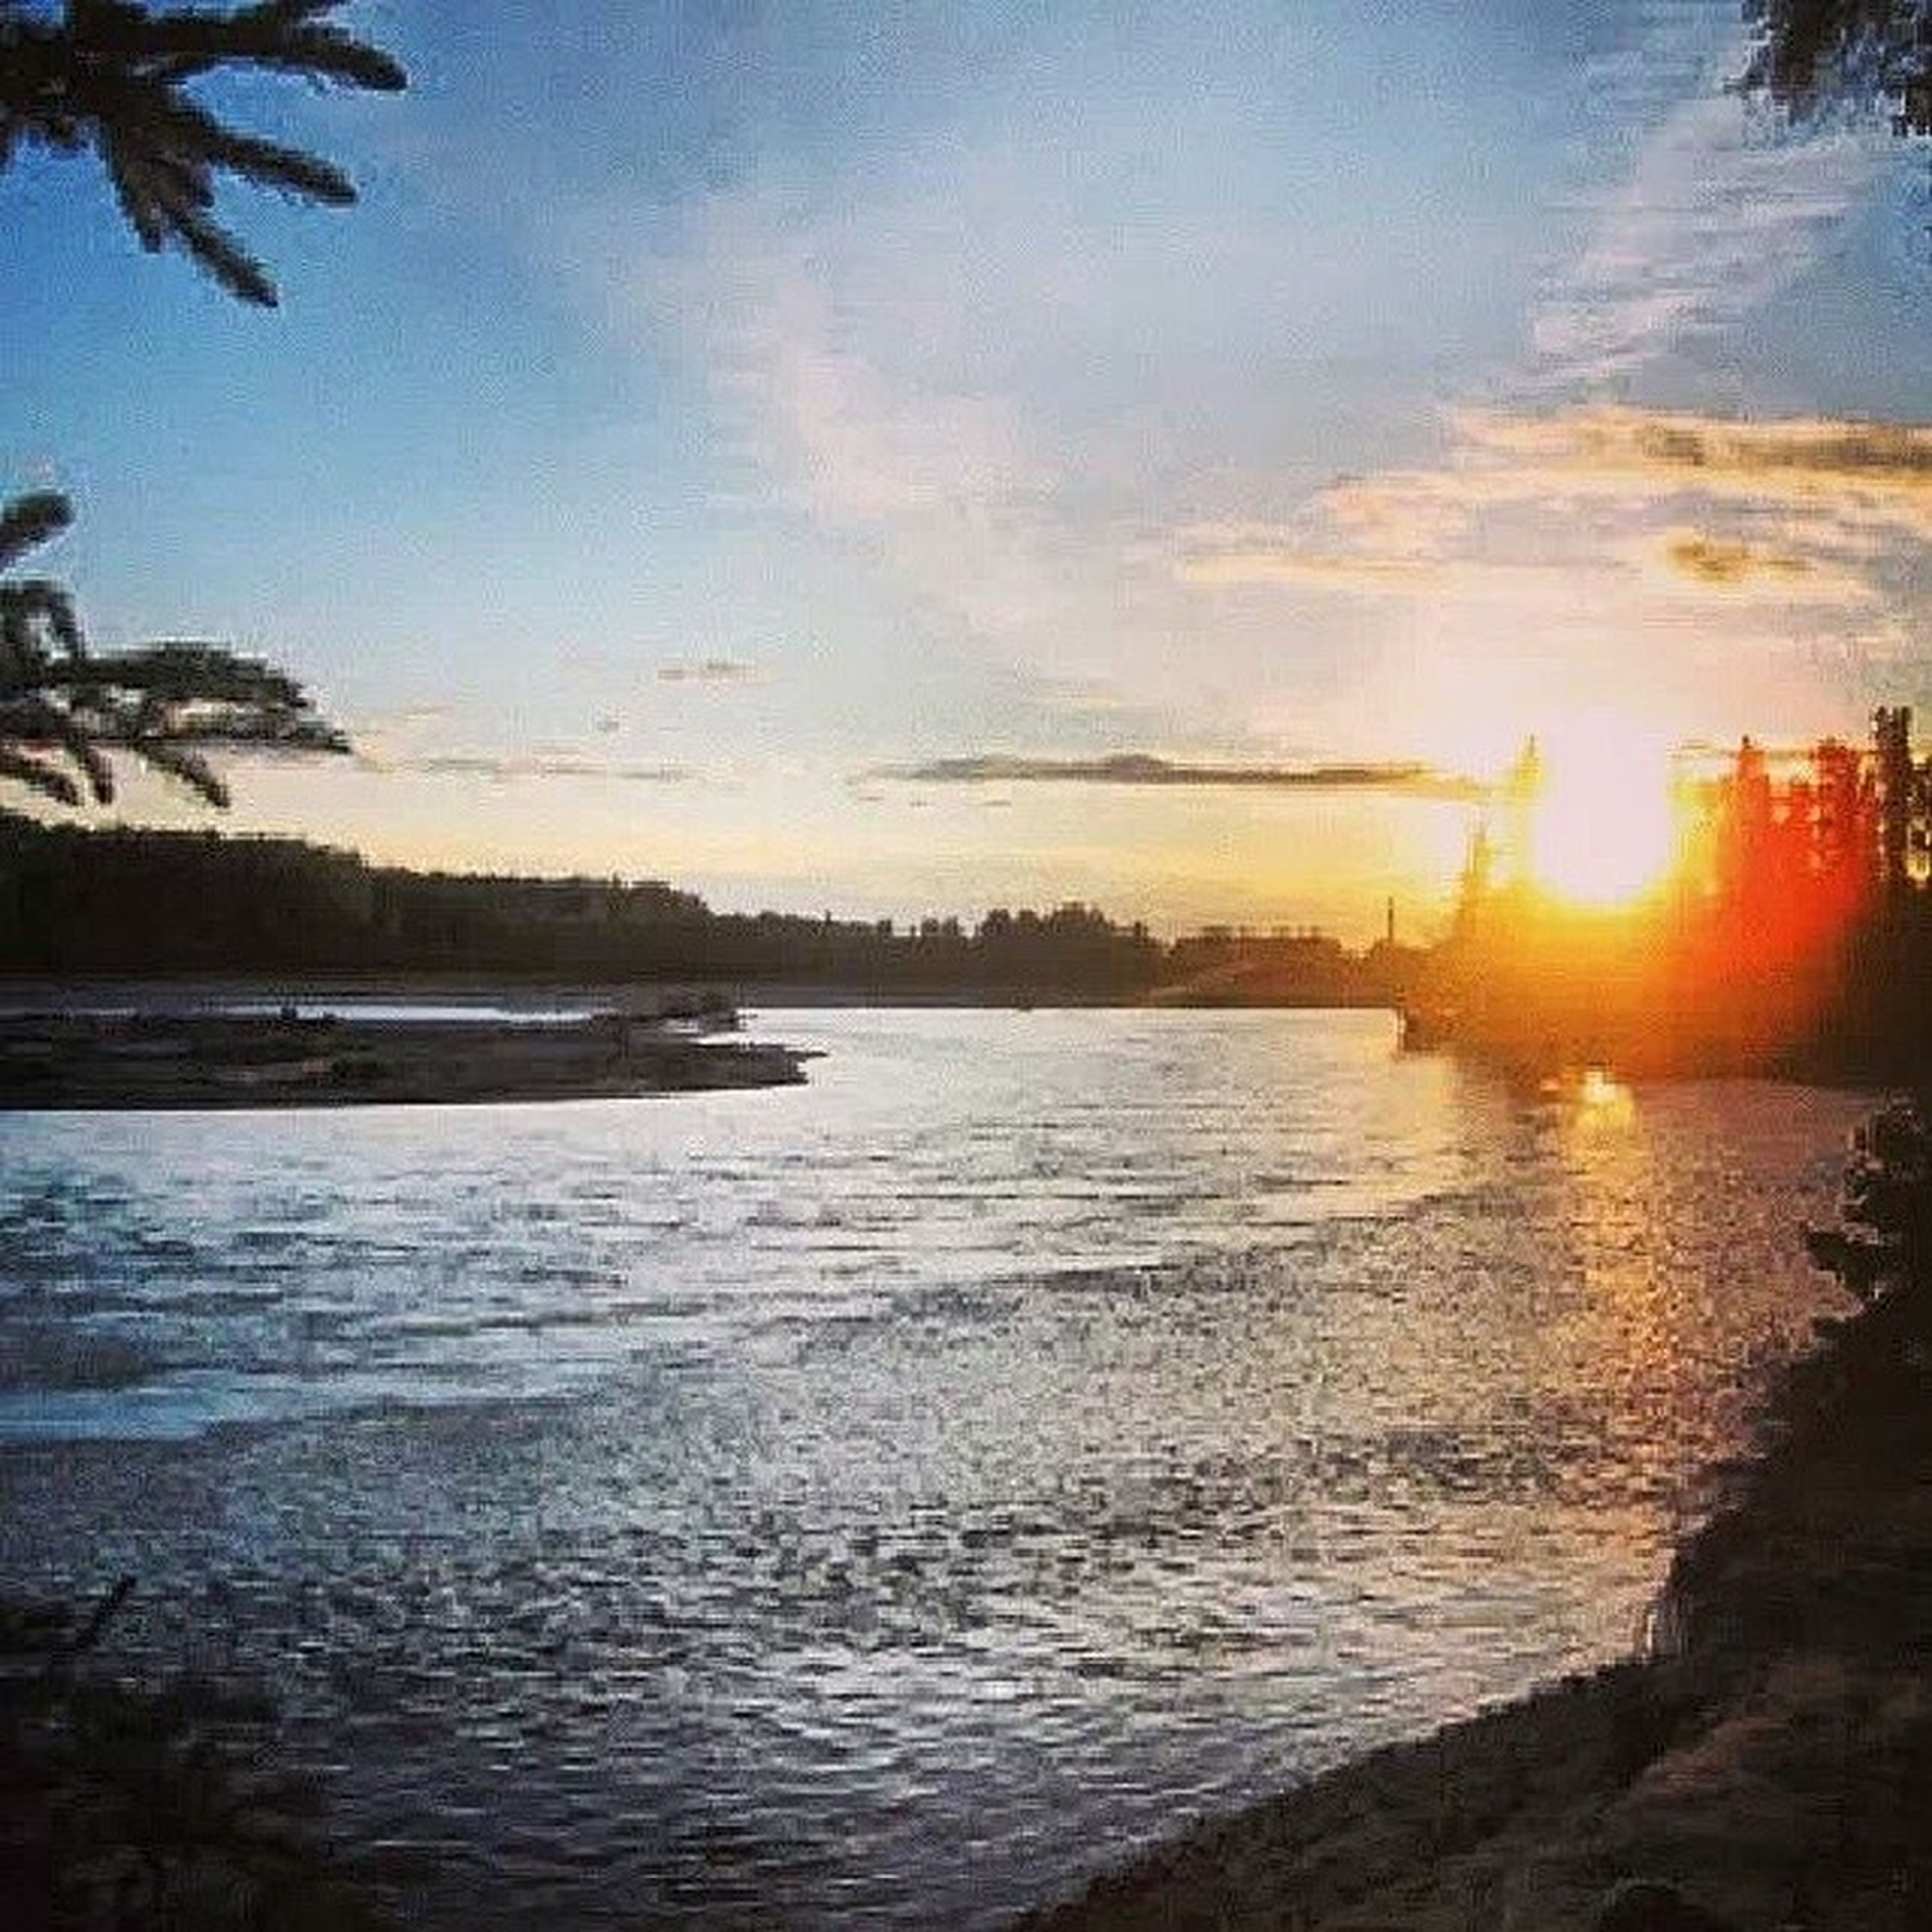 water, sunset, sky, tranquil scene, scenics, tranquility, beauty in nature, reflection, tree, nature, cloud - sky, sun, lake, sunlight, idyllic, silhouette, river, cloud, sunbeam, sea